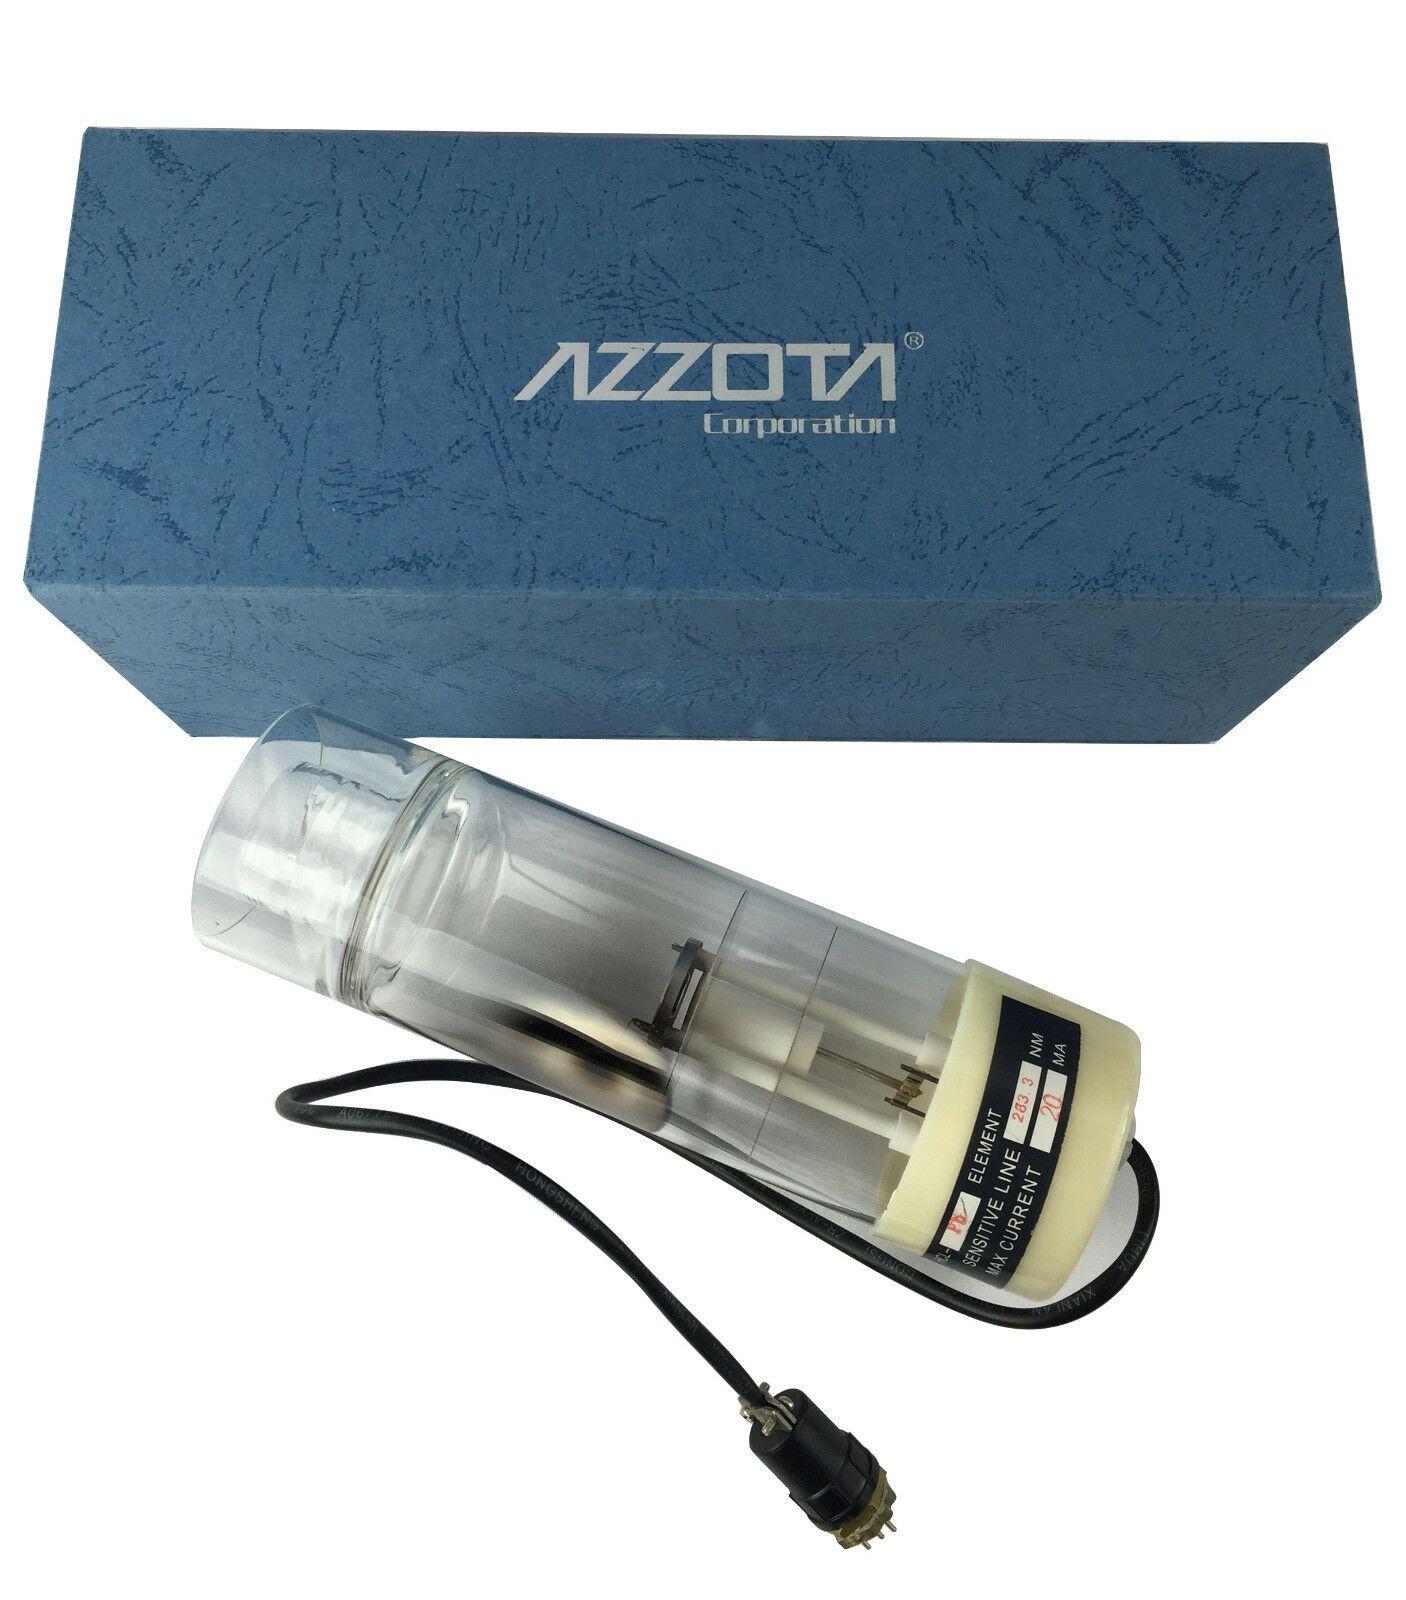 "Azzota 2"" Hollow Cathode Lamp, Potassium (K)"